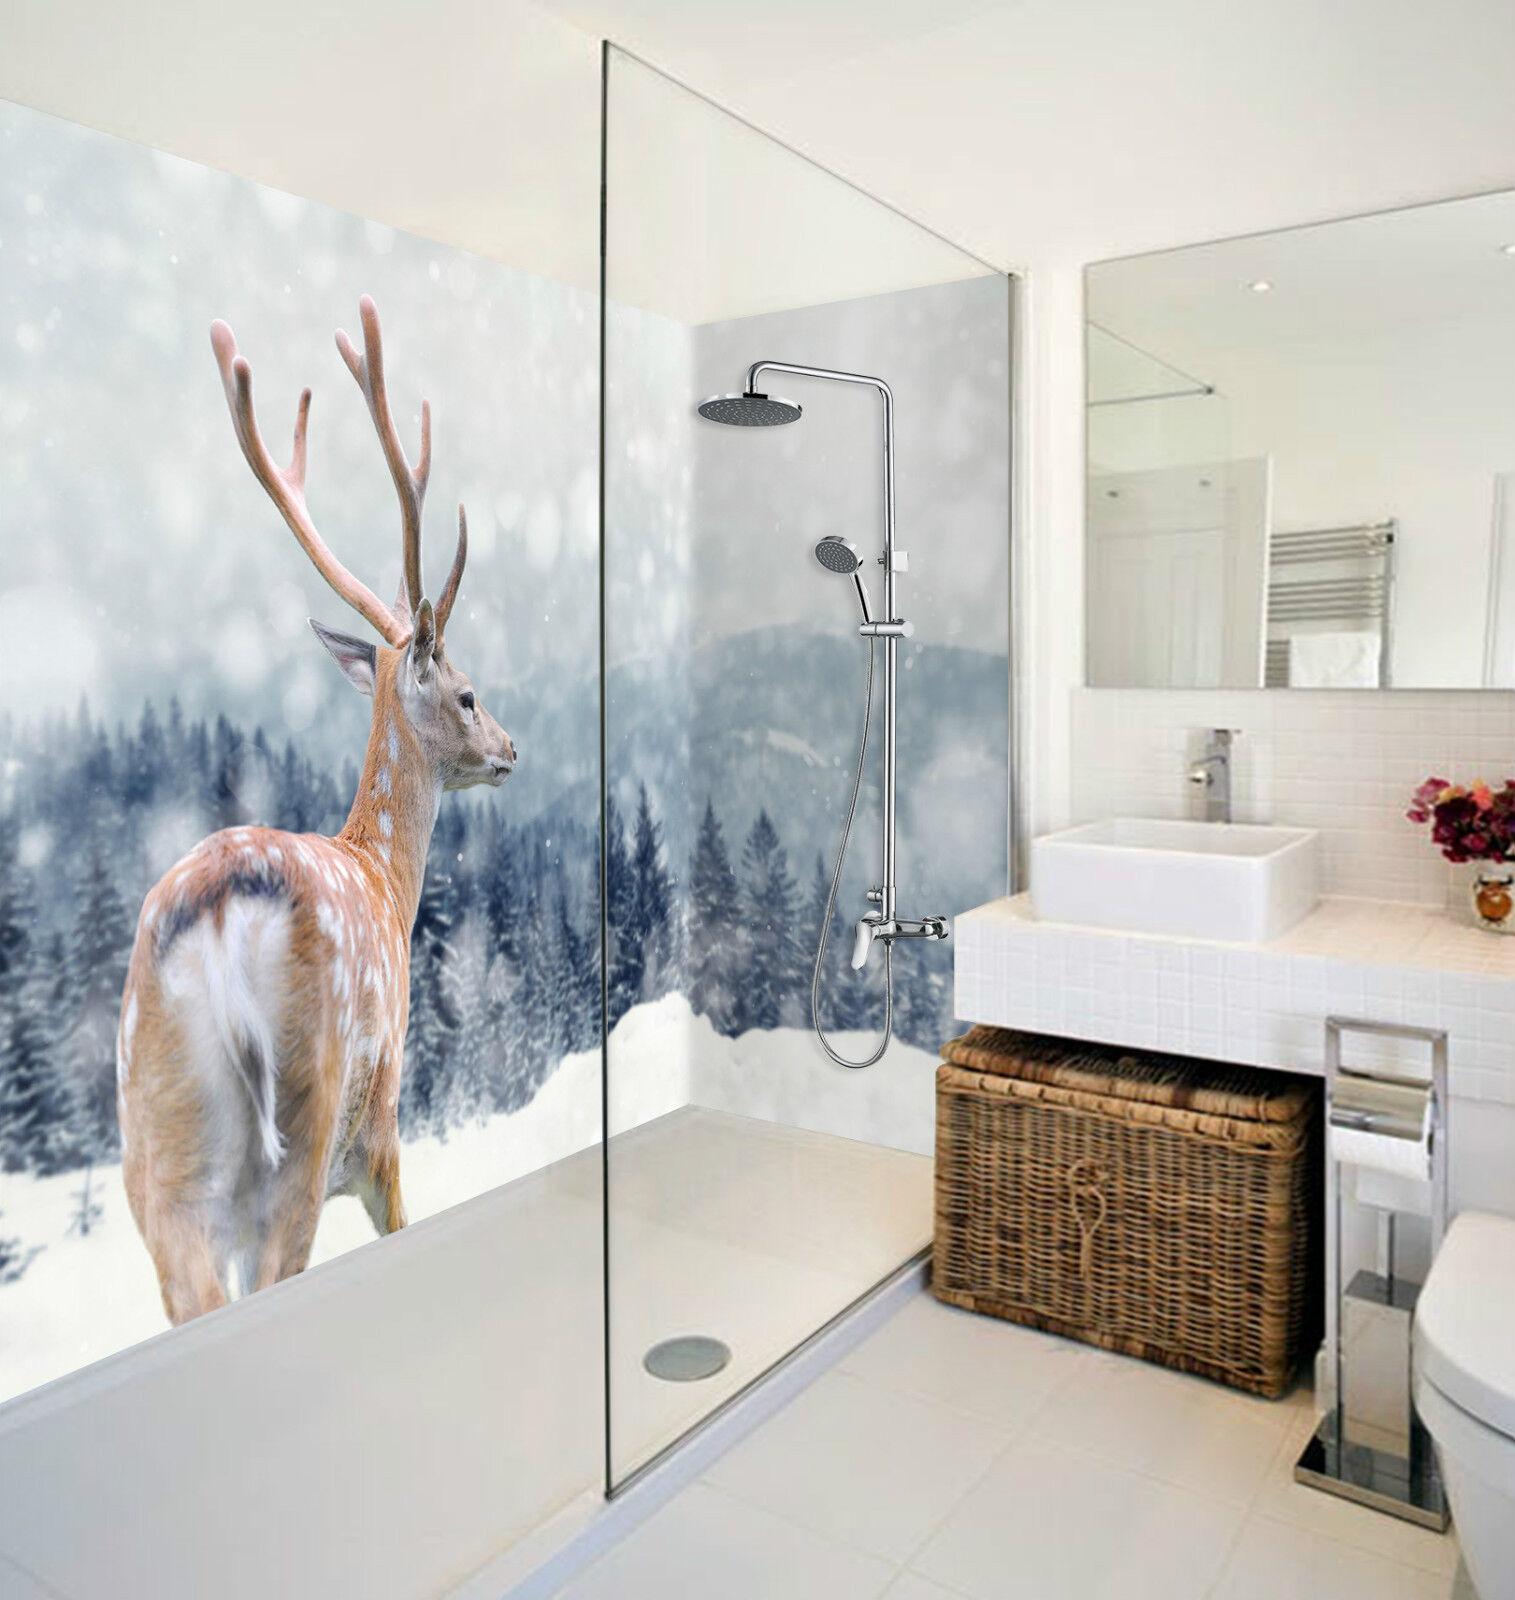 3D Snow Animal 164 WallPaper Bathroom Print Decal Wall Deco AJ WALLPAPER CA